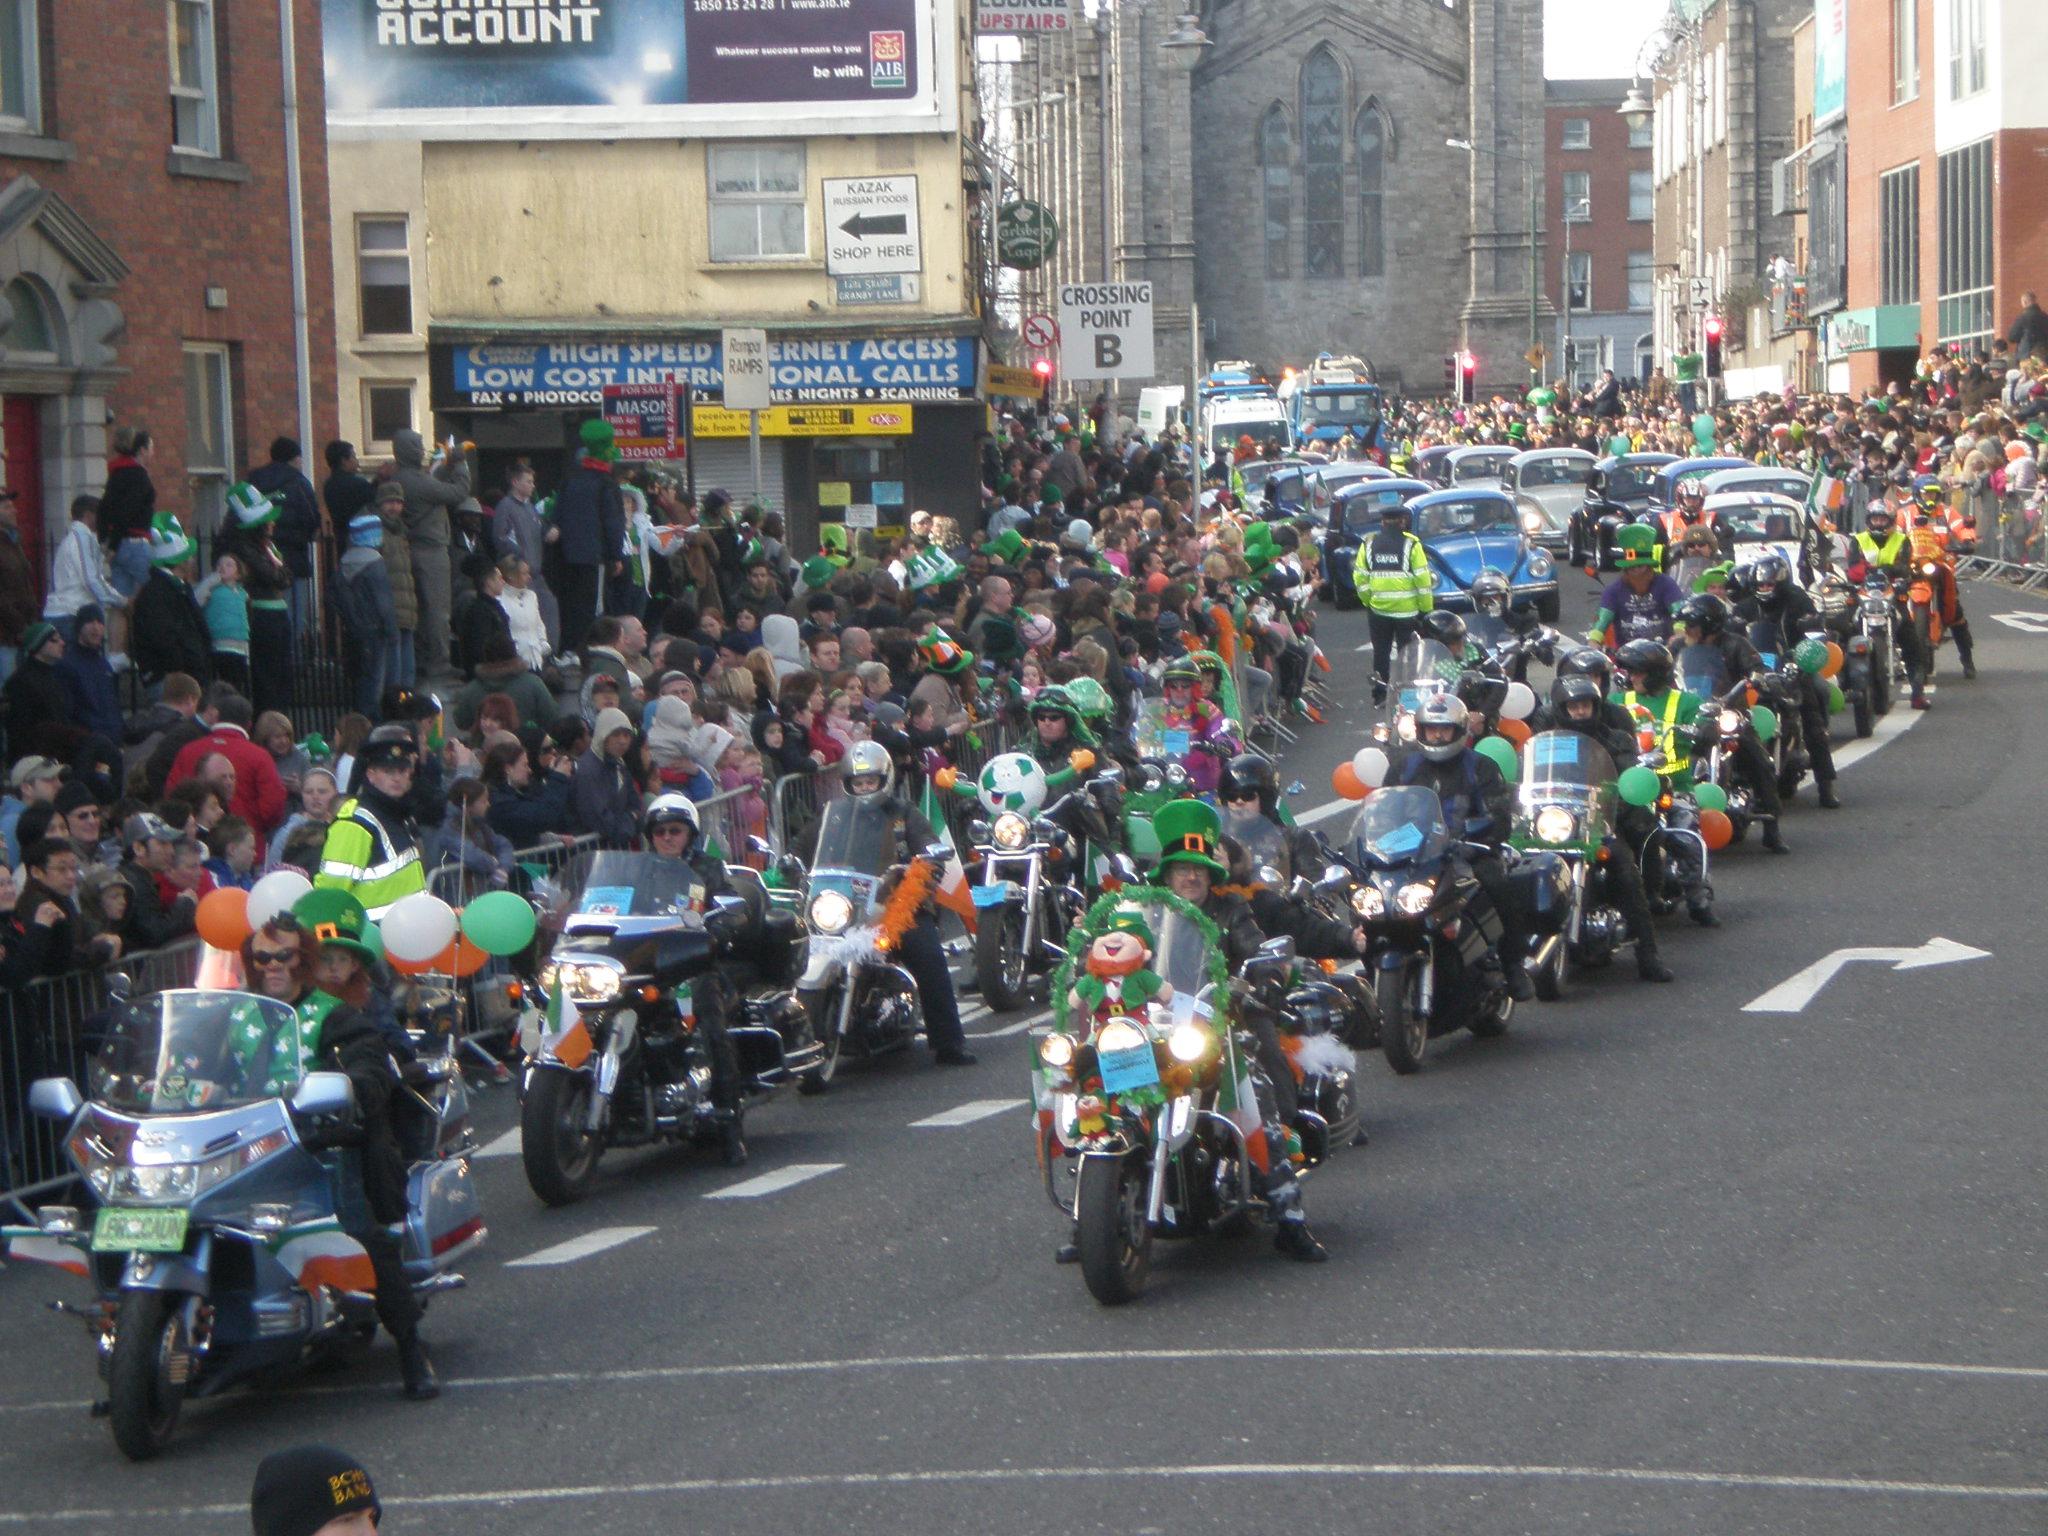 De celebracion en el St. Patrick's Festival